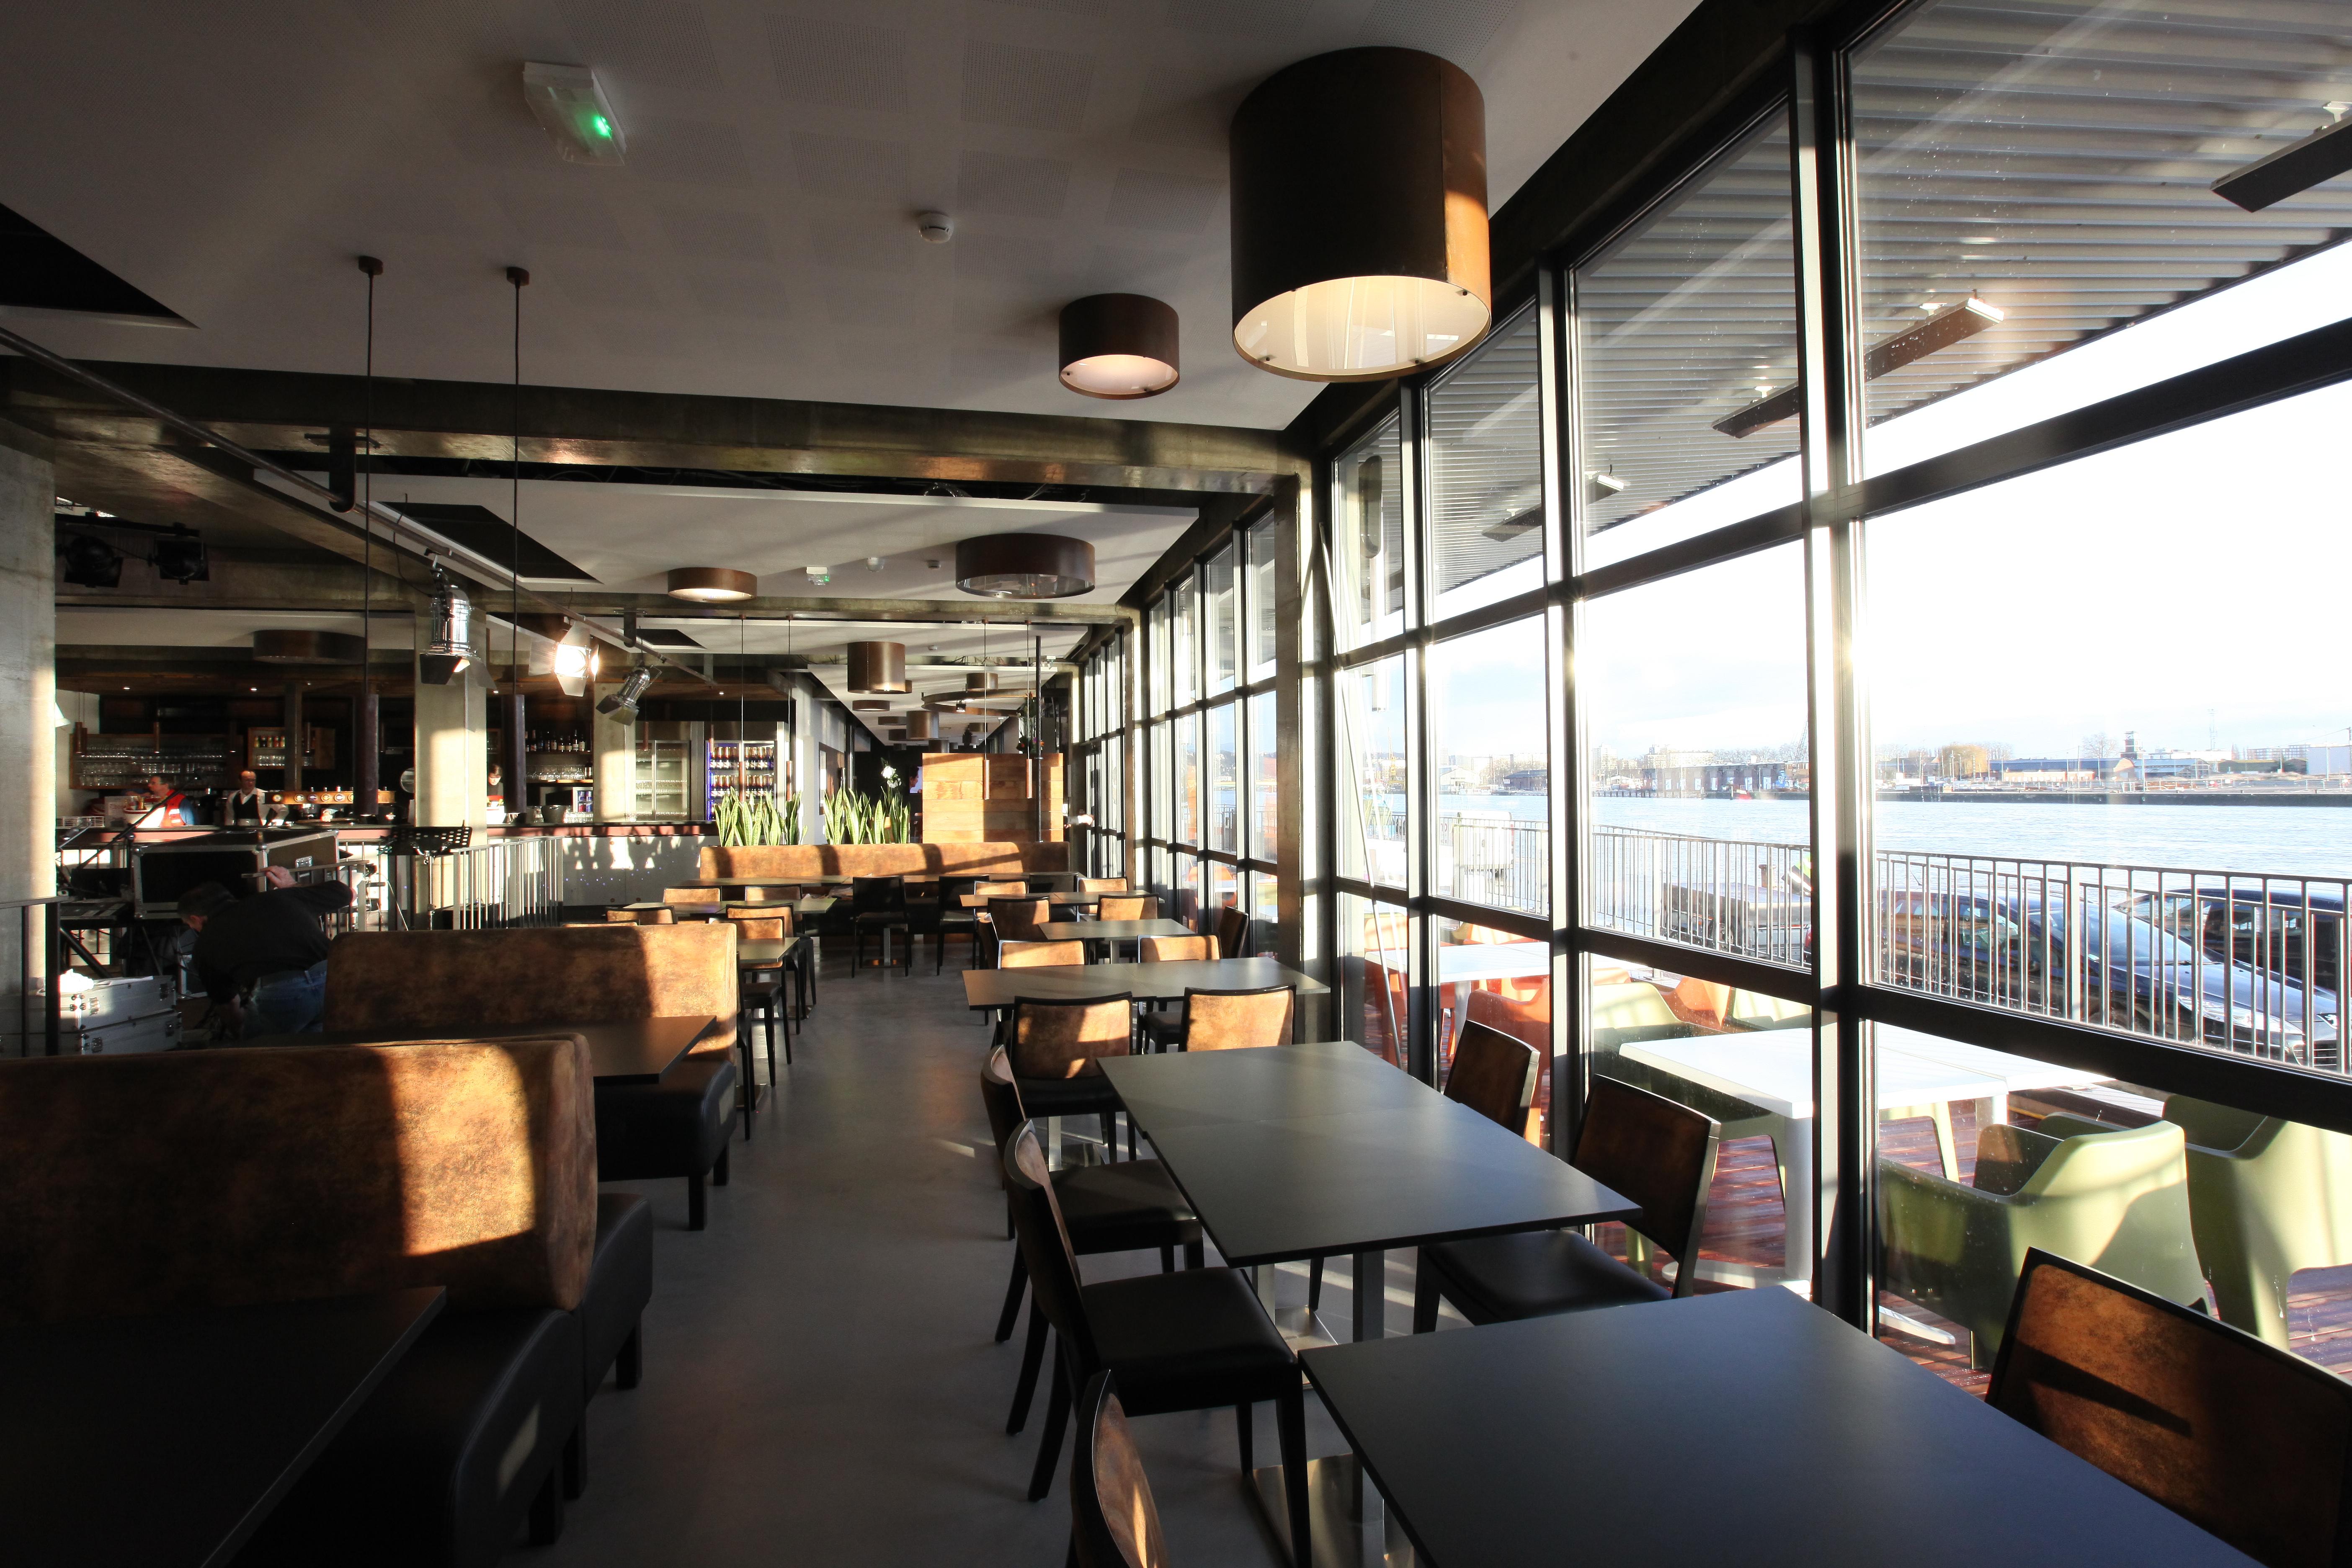 Hotel Restaurant Le Flaubert